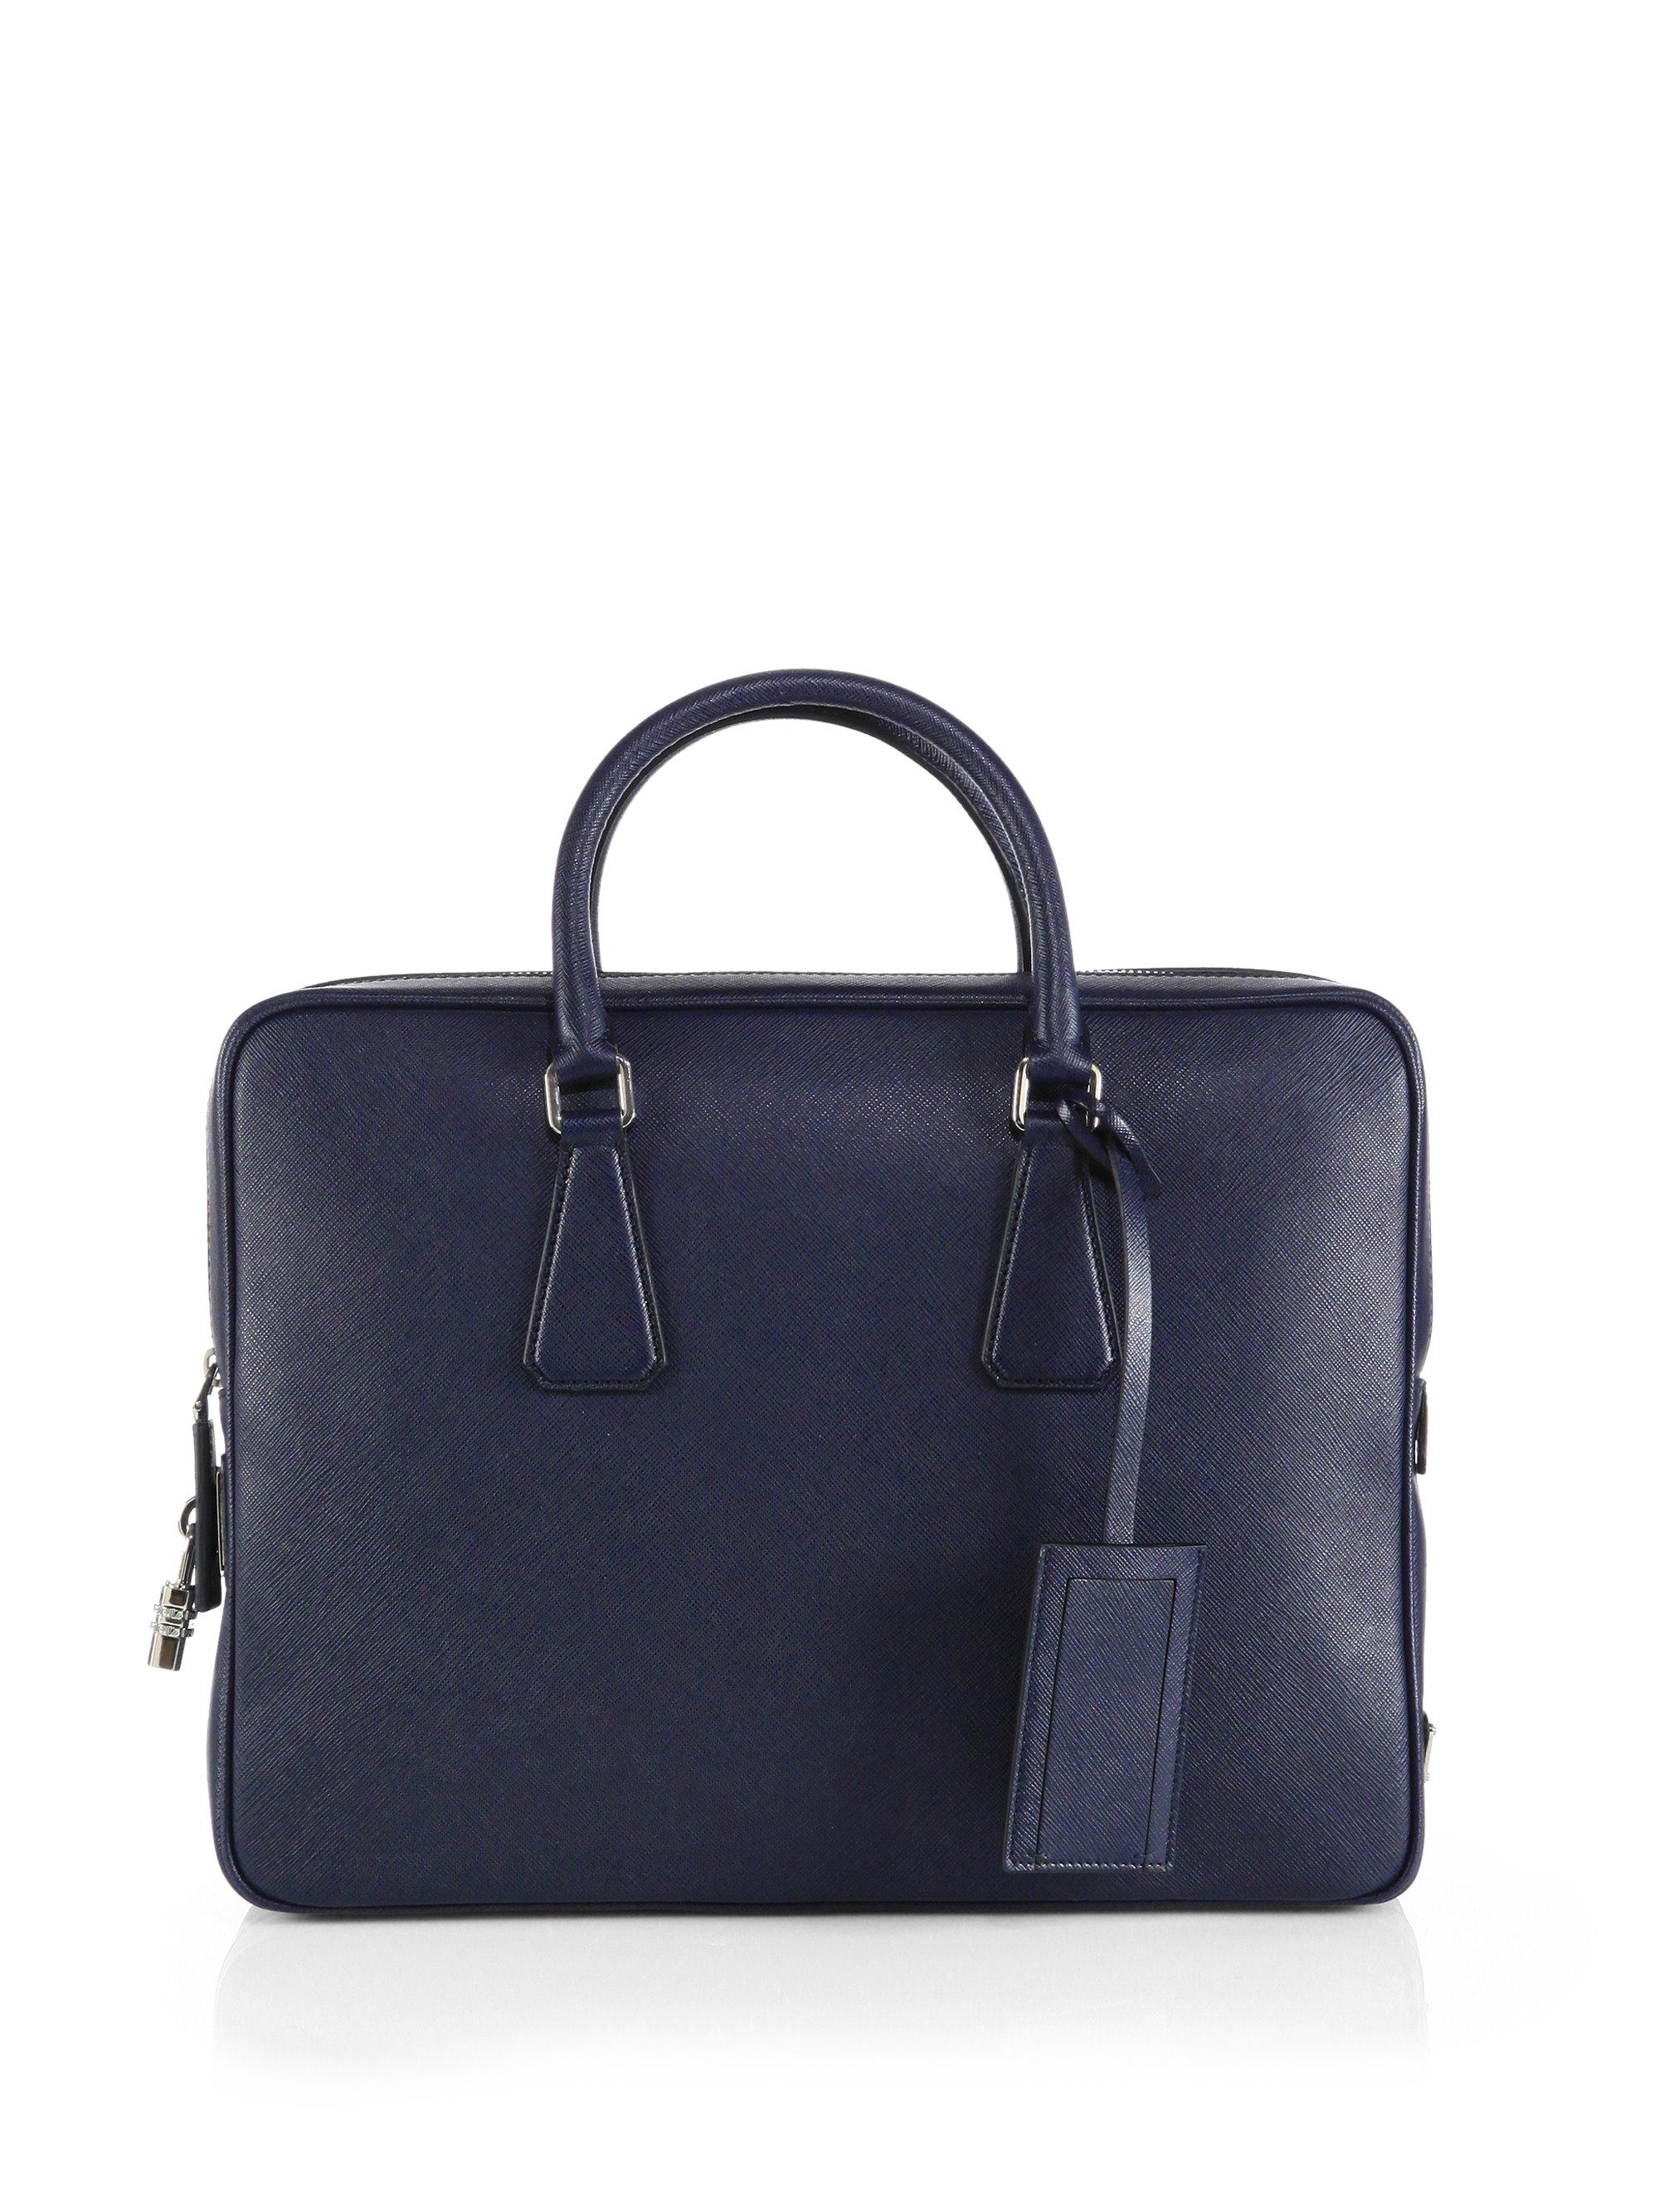 prada clutch bags sale - prada blue, borsa Prad